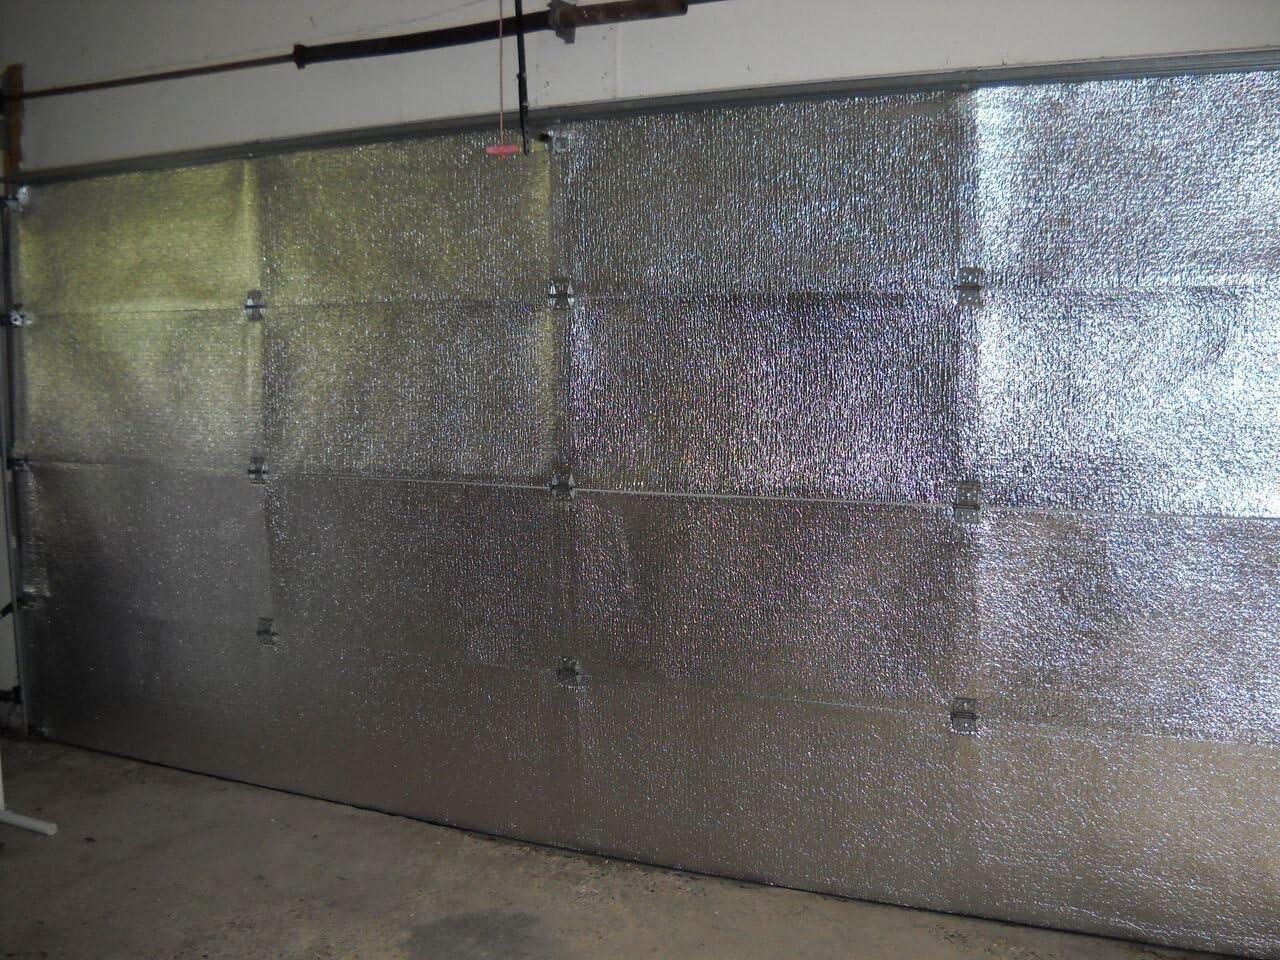 NASA Tech White Reflective Foam Garage お見舞い Door 販売 Core Insulation Kit1